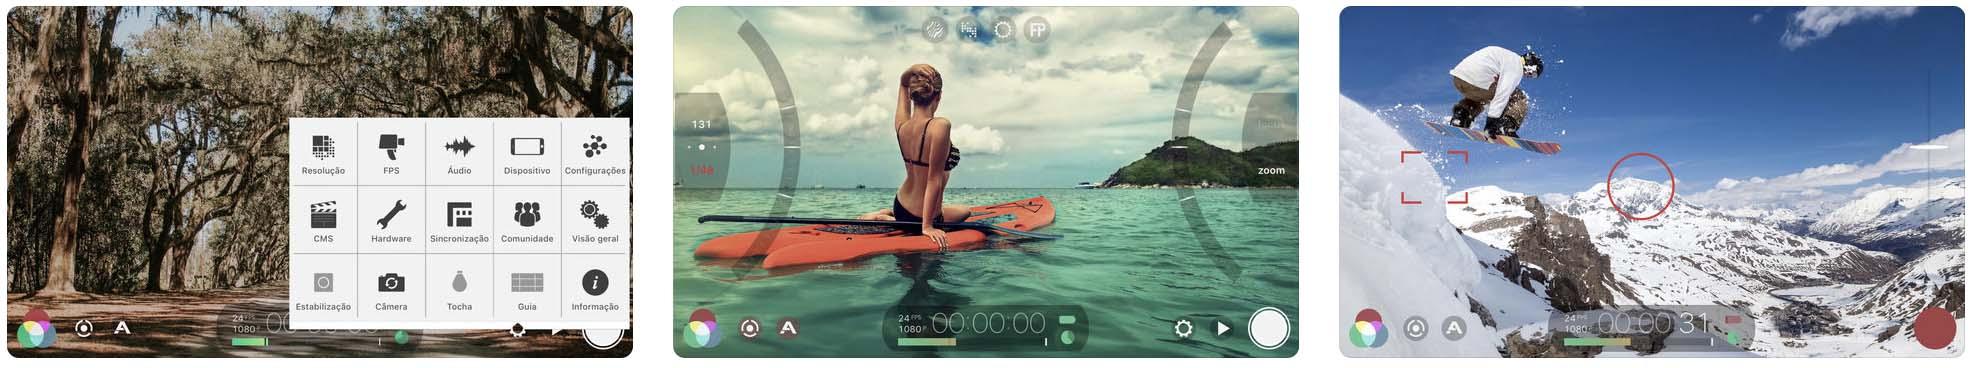 Telas do aplicativo FilmicPro